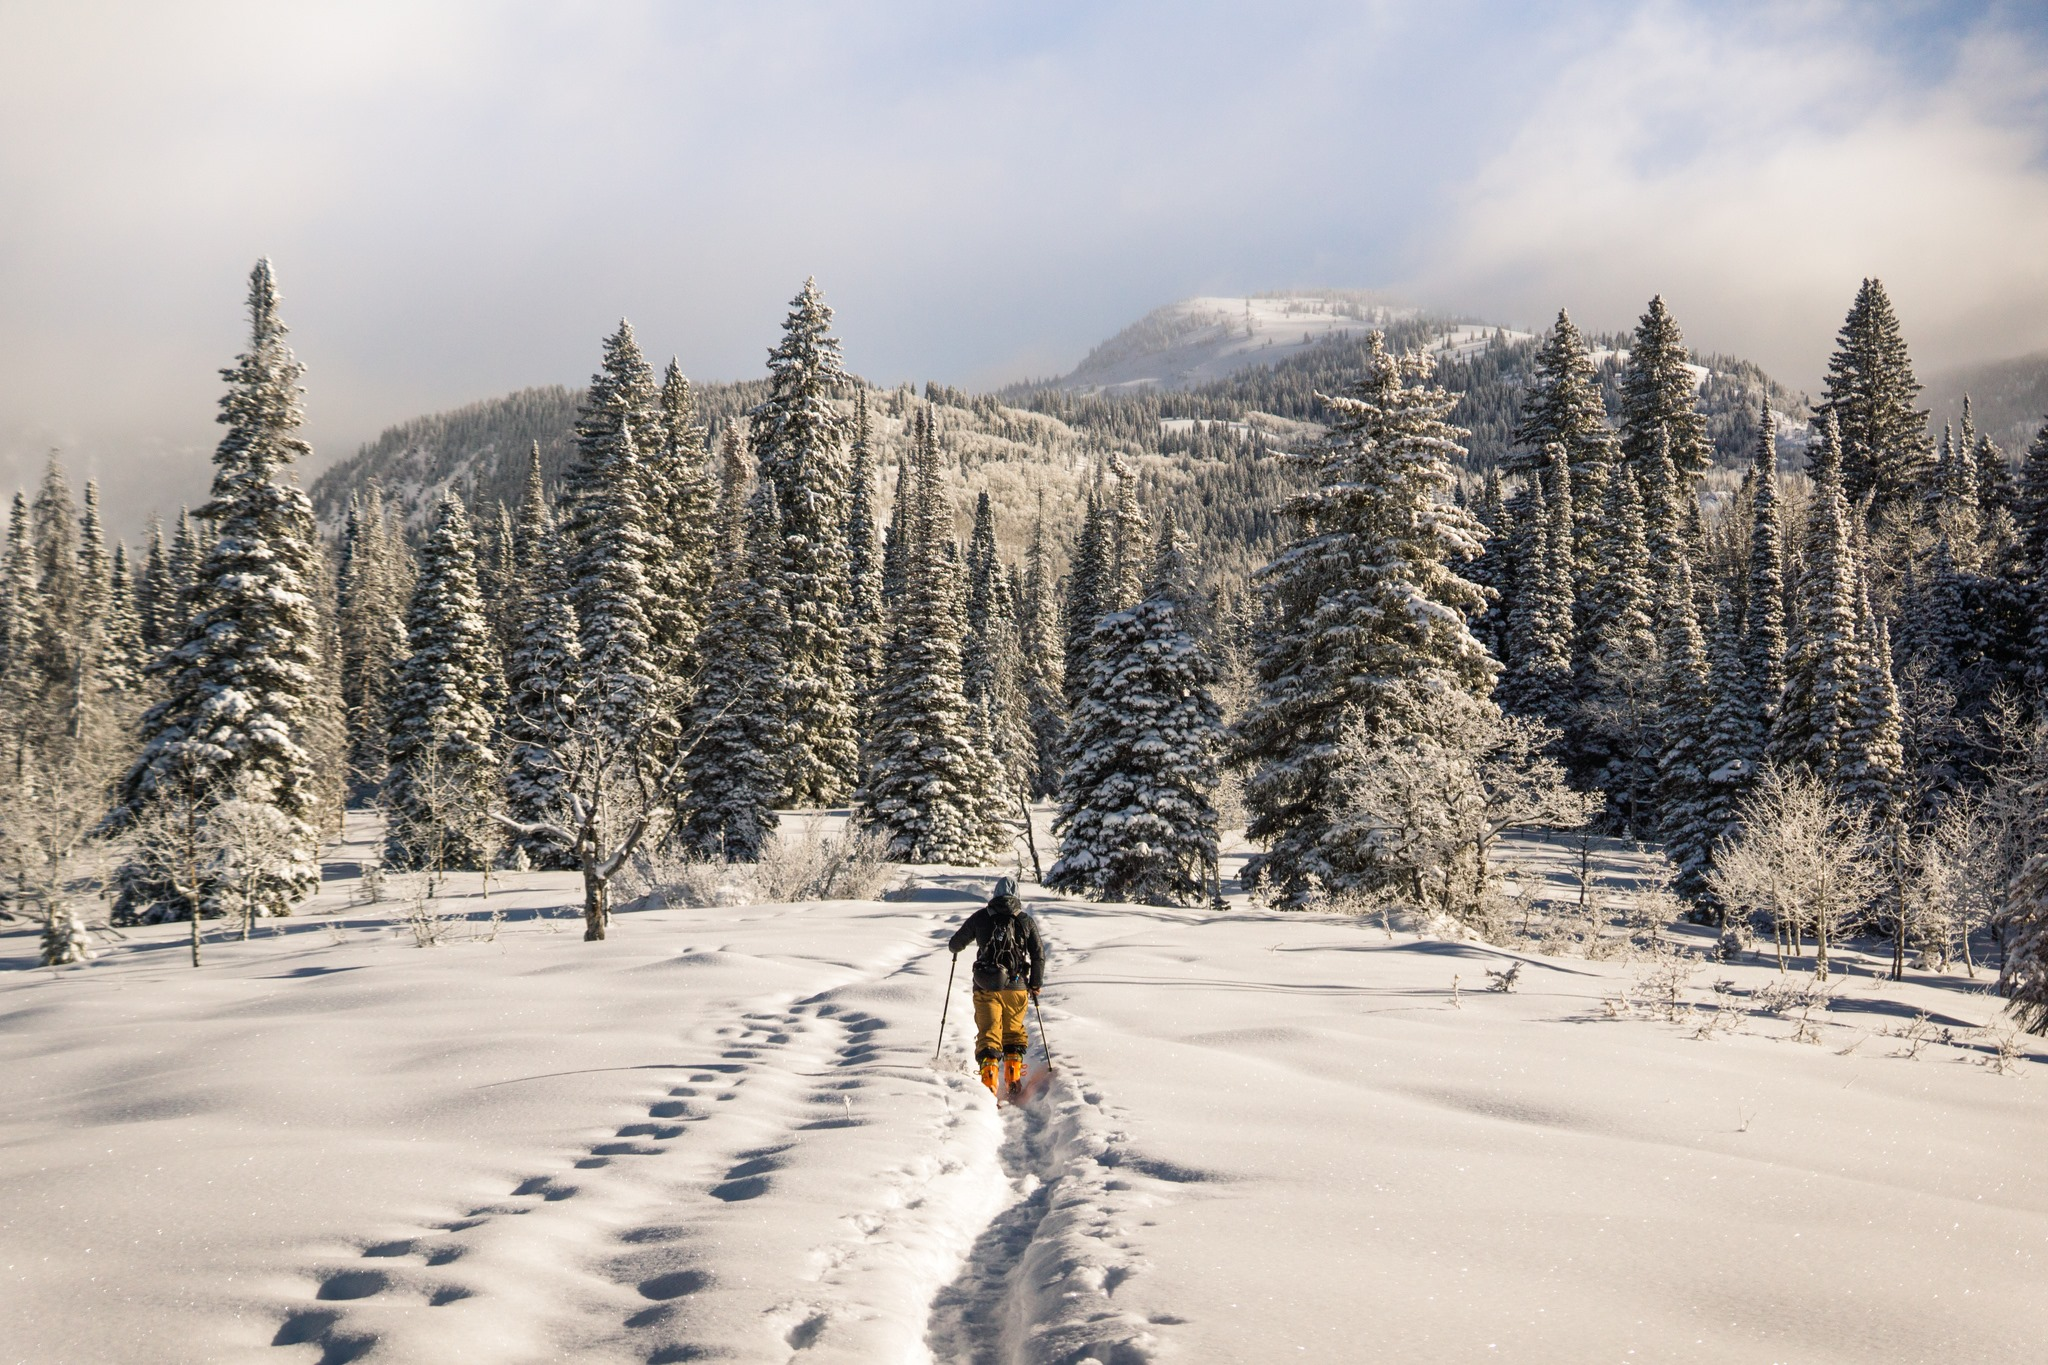 Mt Baker Lodging Mount Baker Washington Cross Country Skiing.